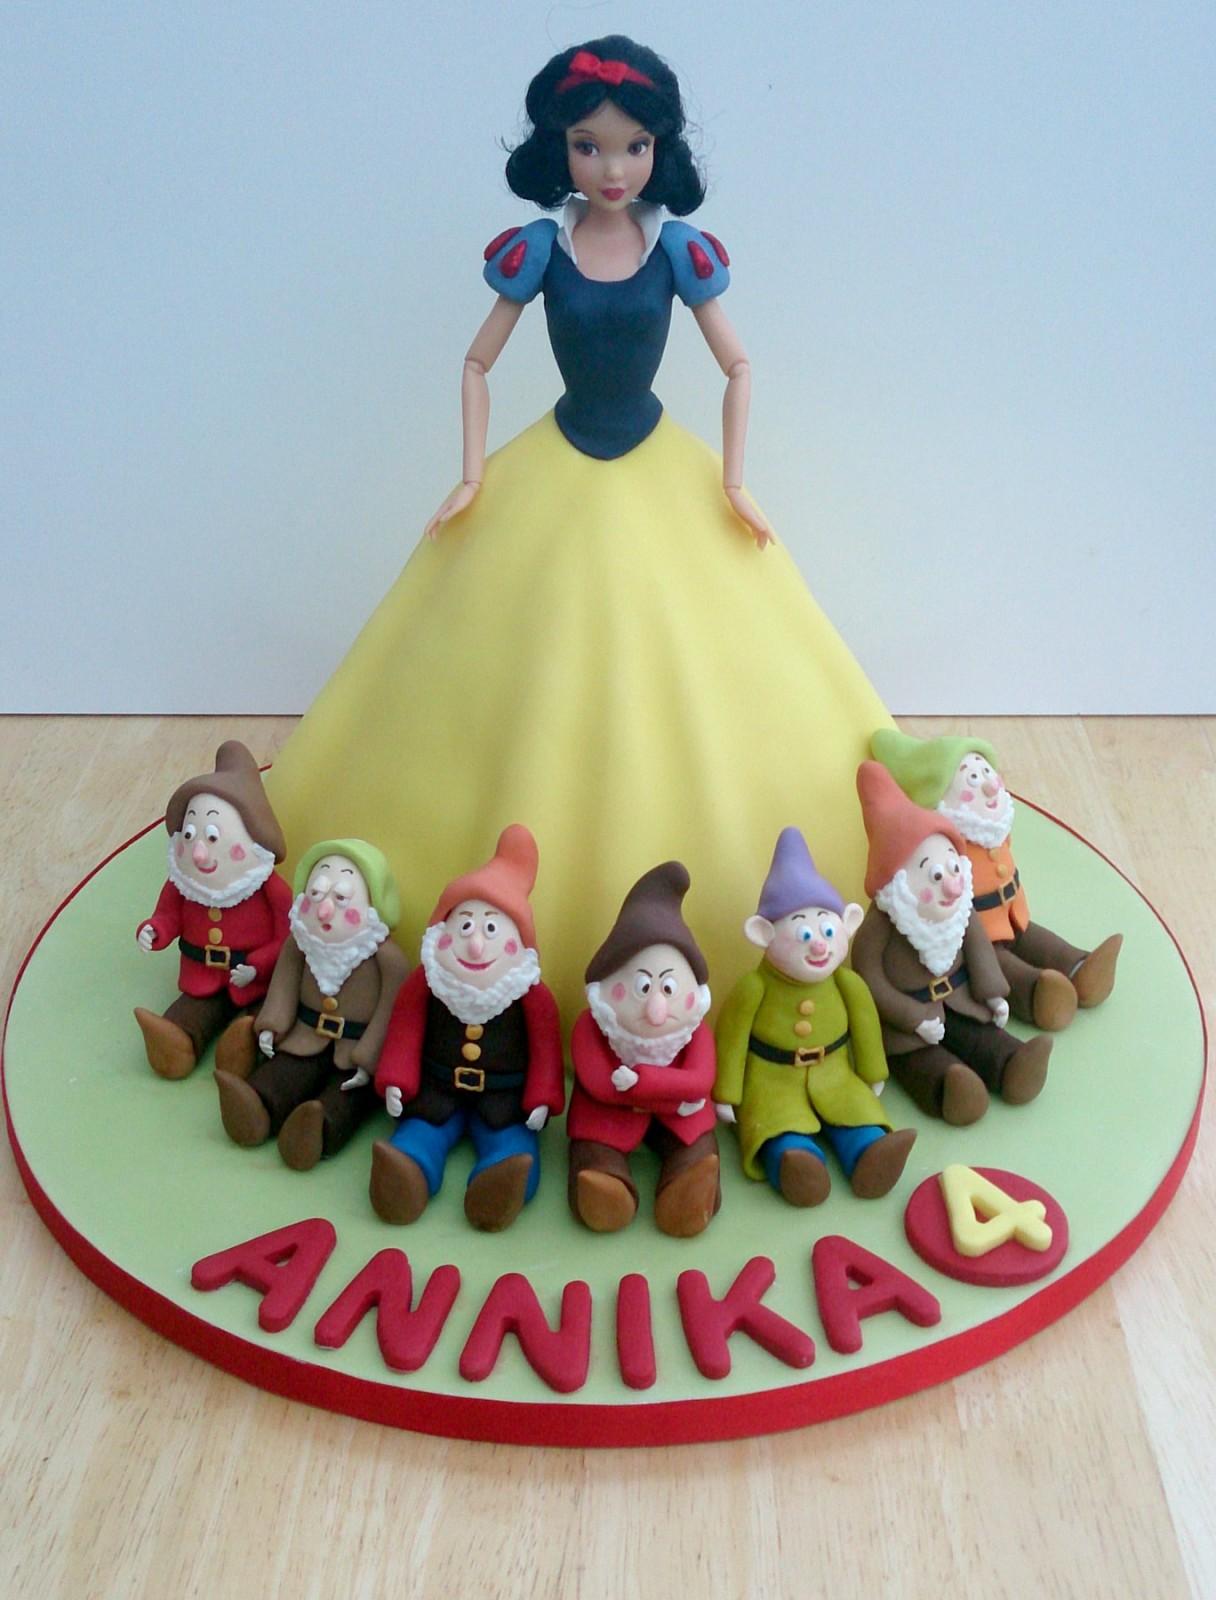 Fine Snow White And The Seven Dwarfs Birthday Cake Susies Cakes Funny Birthday Cards Online Alyptdamsfinfo